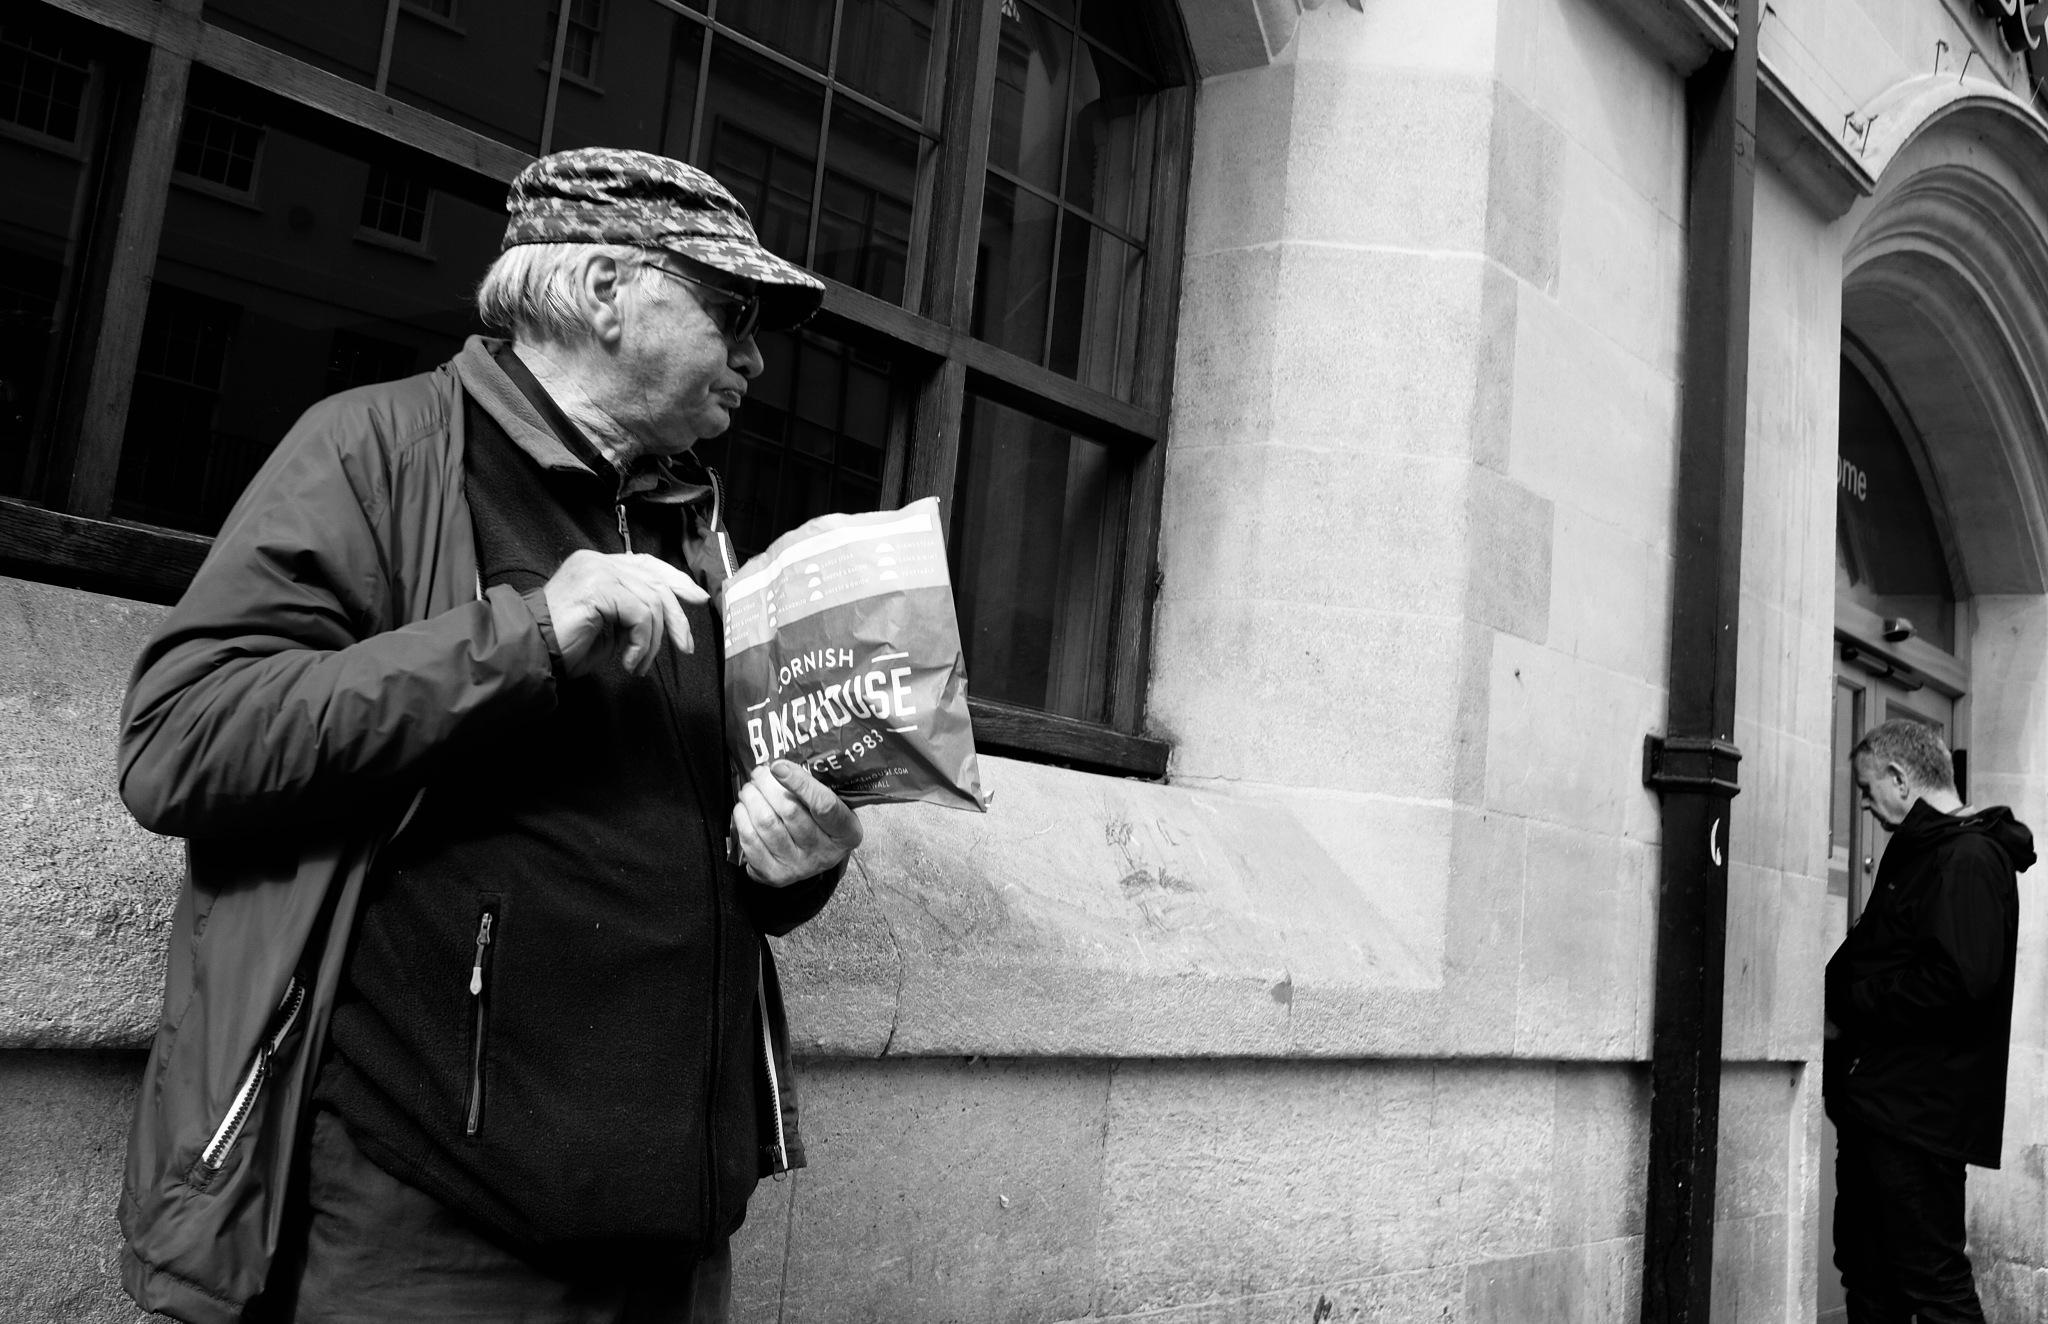 Oxford UK by Jim Darke